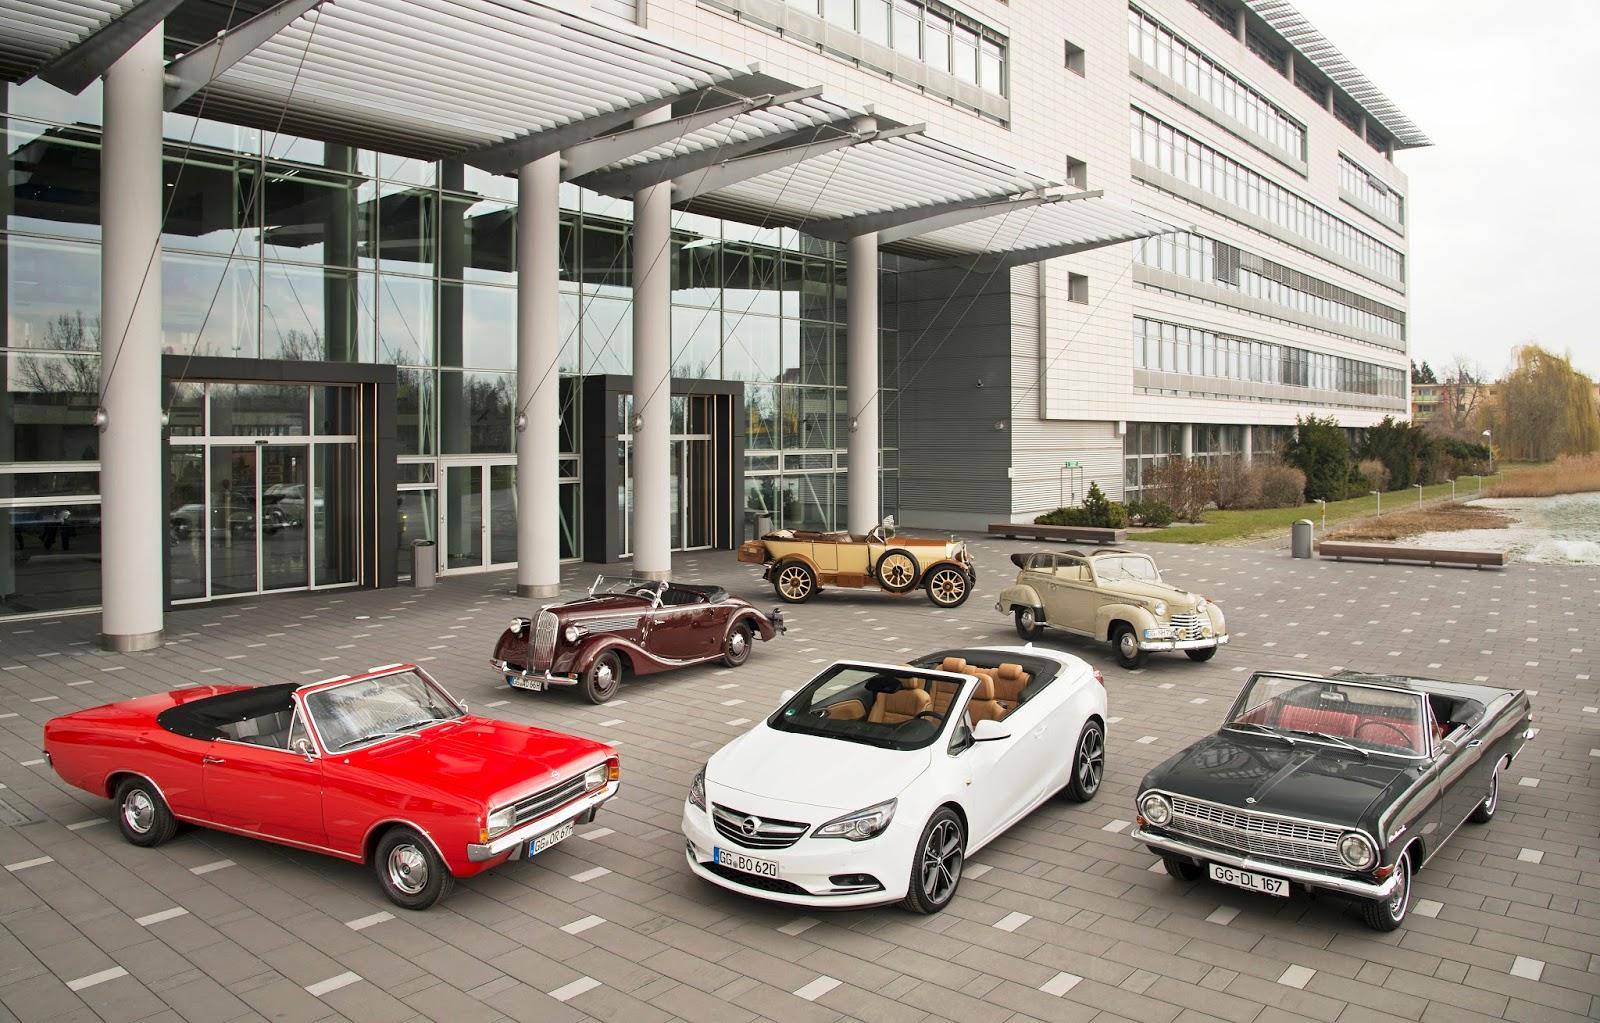 Opel Rallye Hessen Th25C325BCringen 301769 H Πλούσια Κληρονομιά των Opel Cabrio cabrio, Opel, Opel 8/25 hp, Opel Cascada, Opel Olympia, Opel Record, Opel Super 6